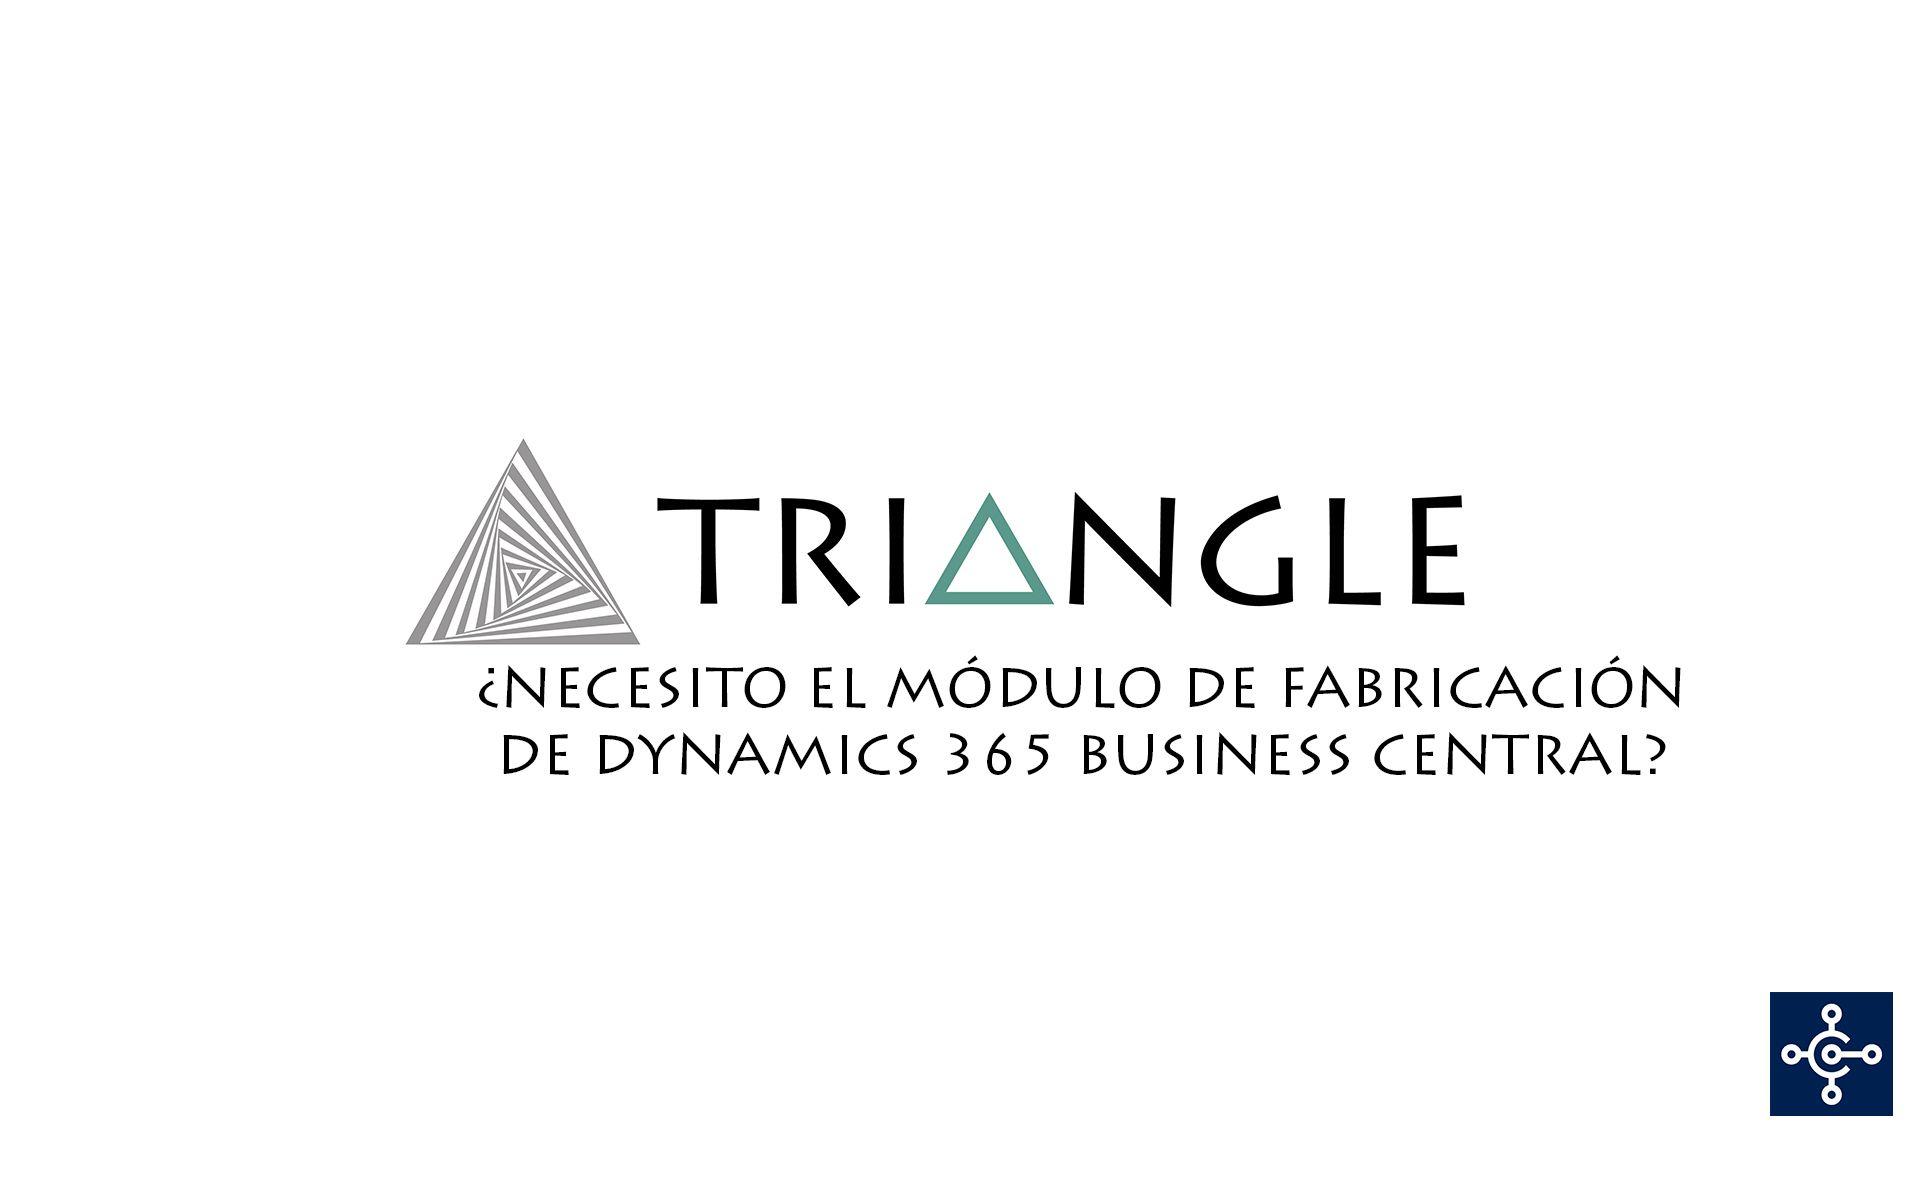 Fabricacion-dynamics-365-business-central